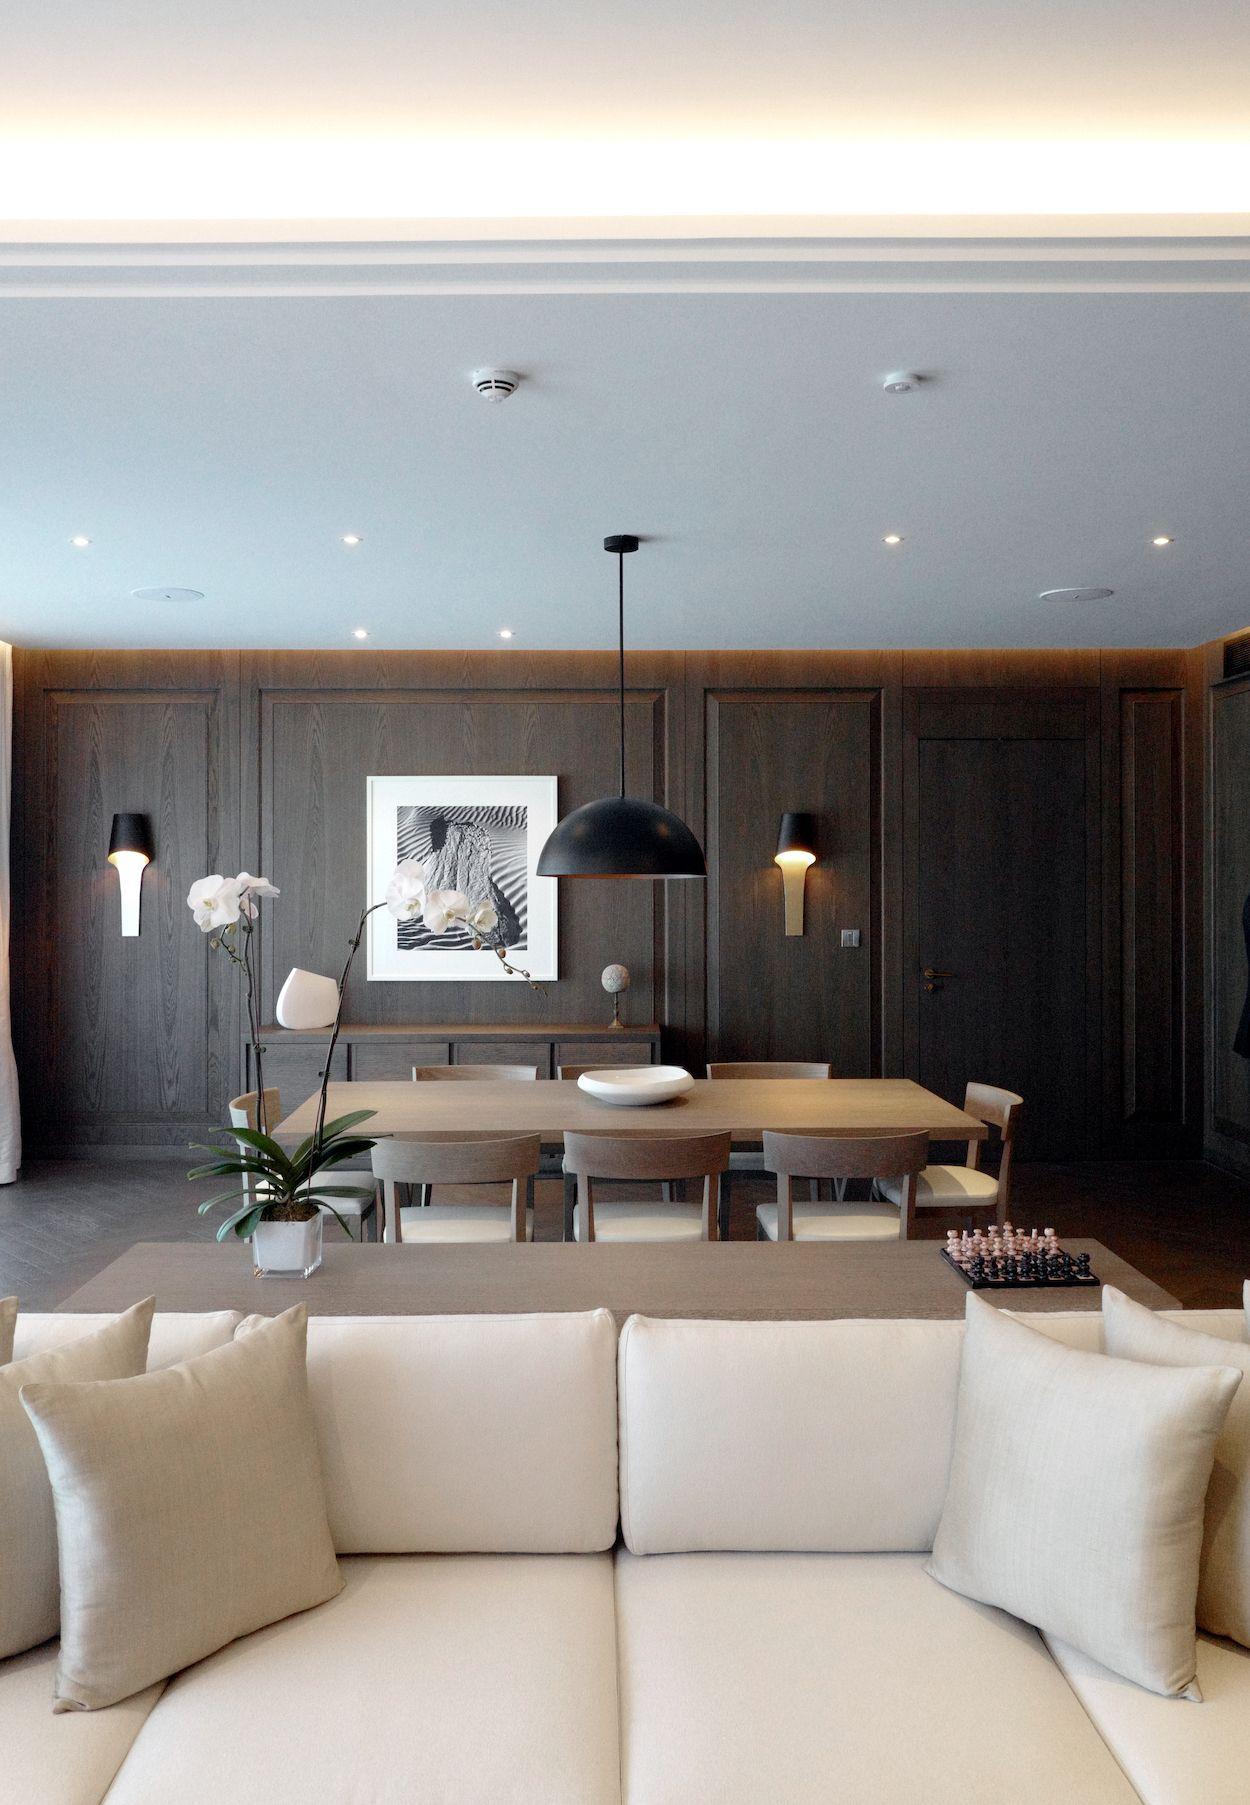 Abu Dhabi Edition By Ian Schrager Company Design Milk Ian Schrager Design Interior Design